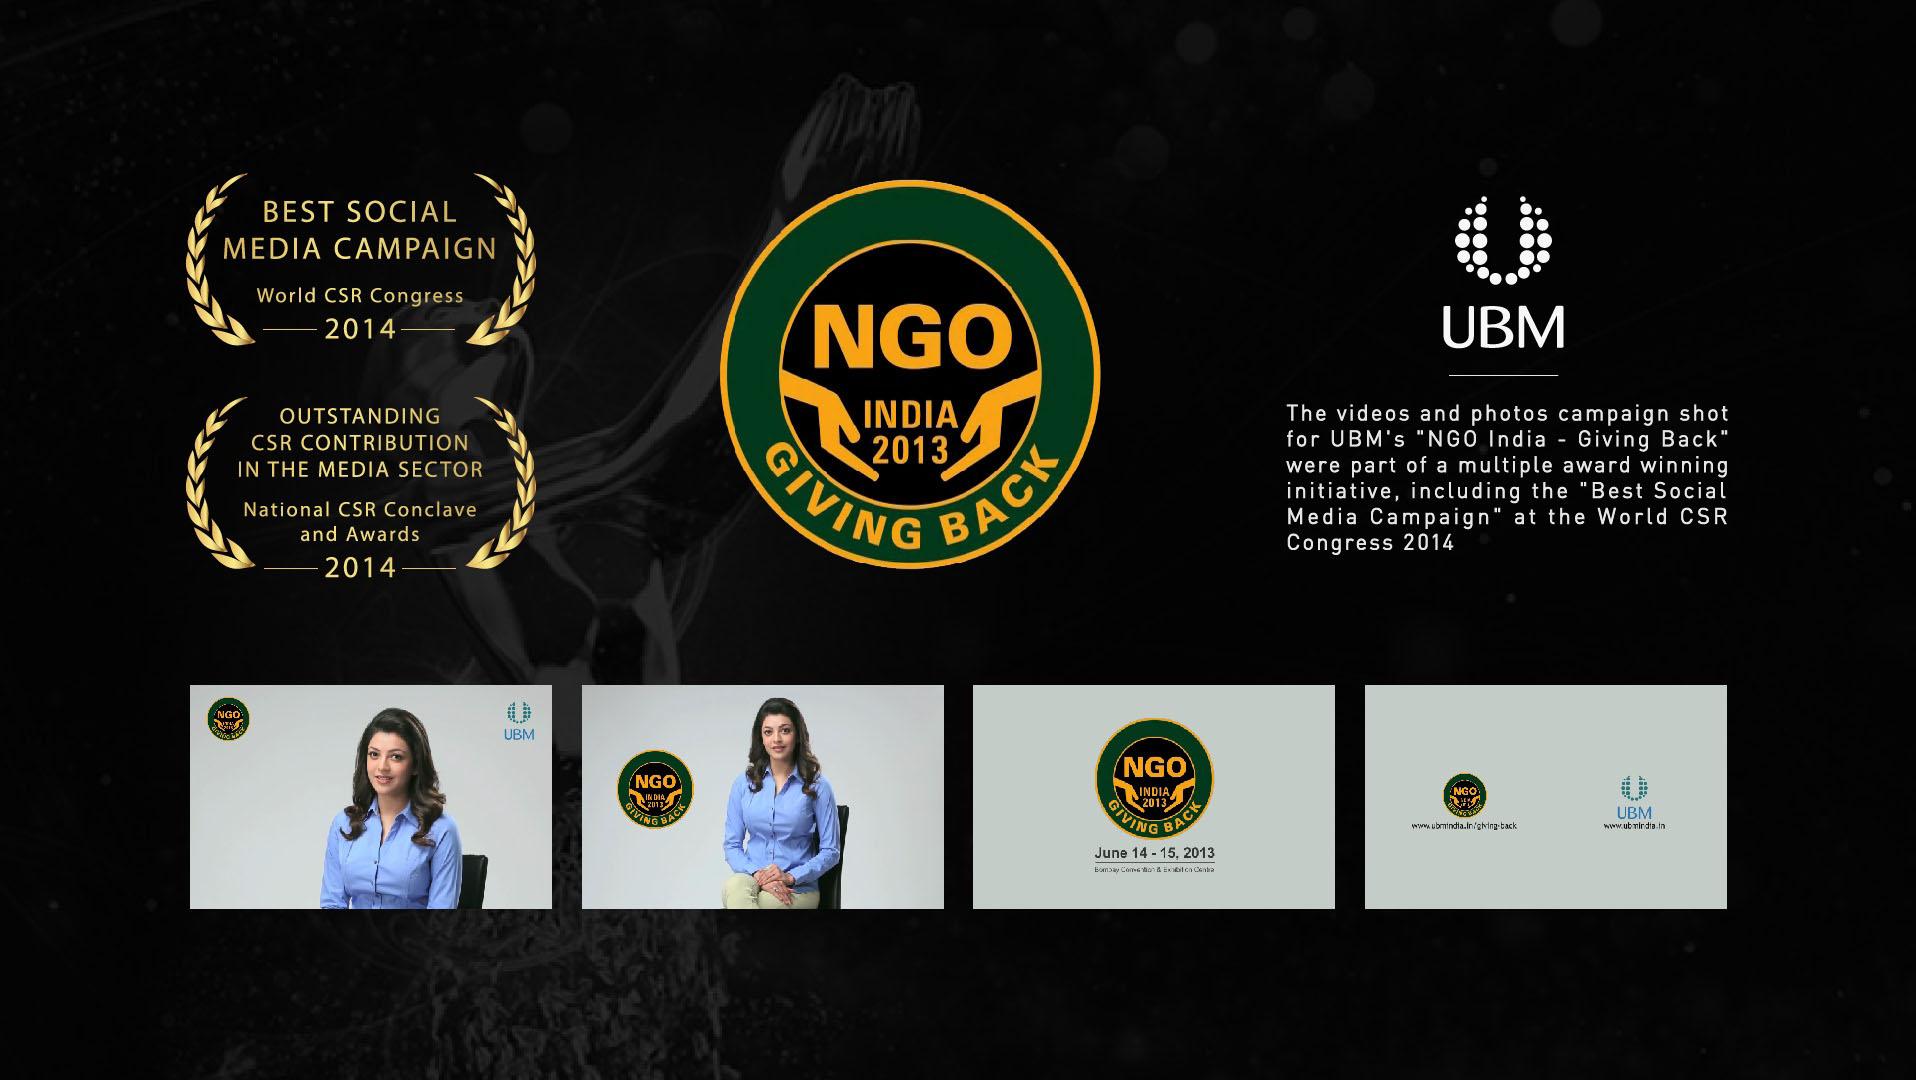 UBM – Giving Back Campaign